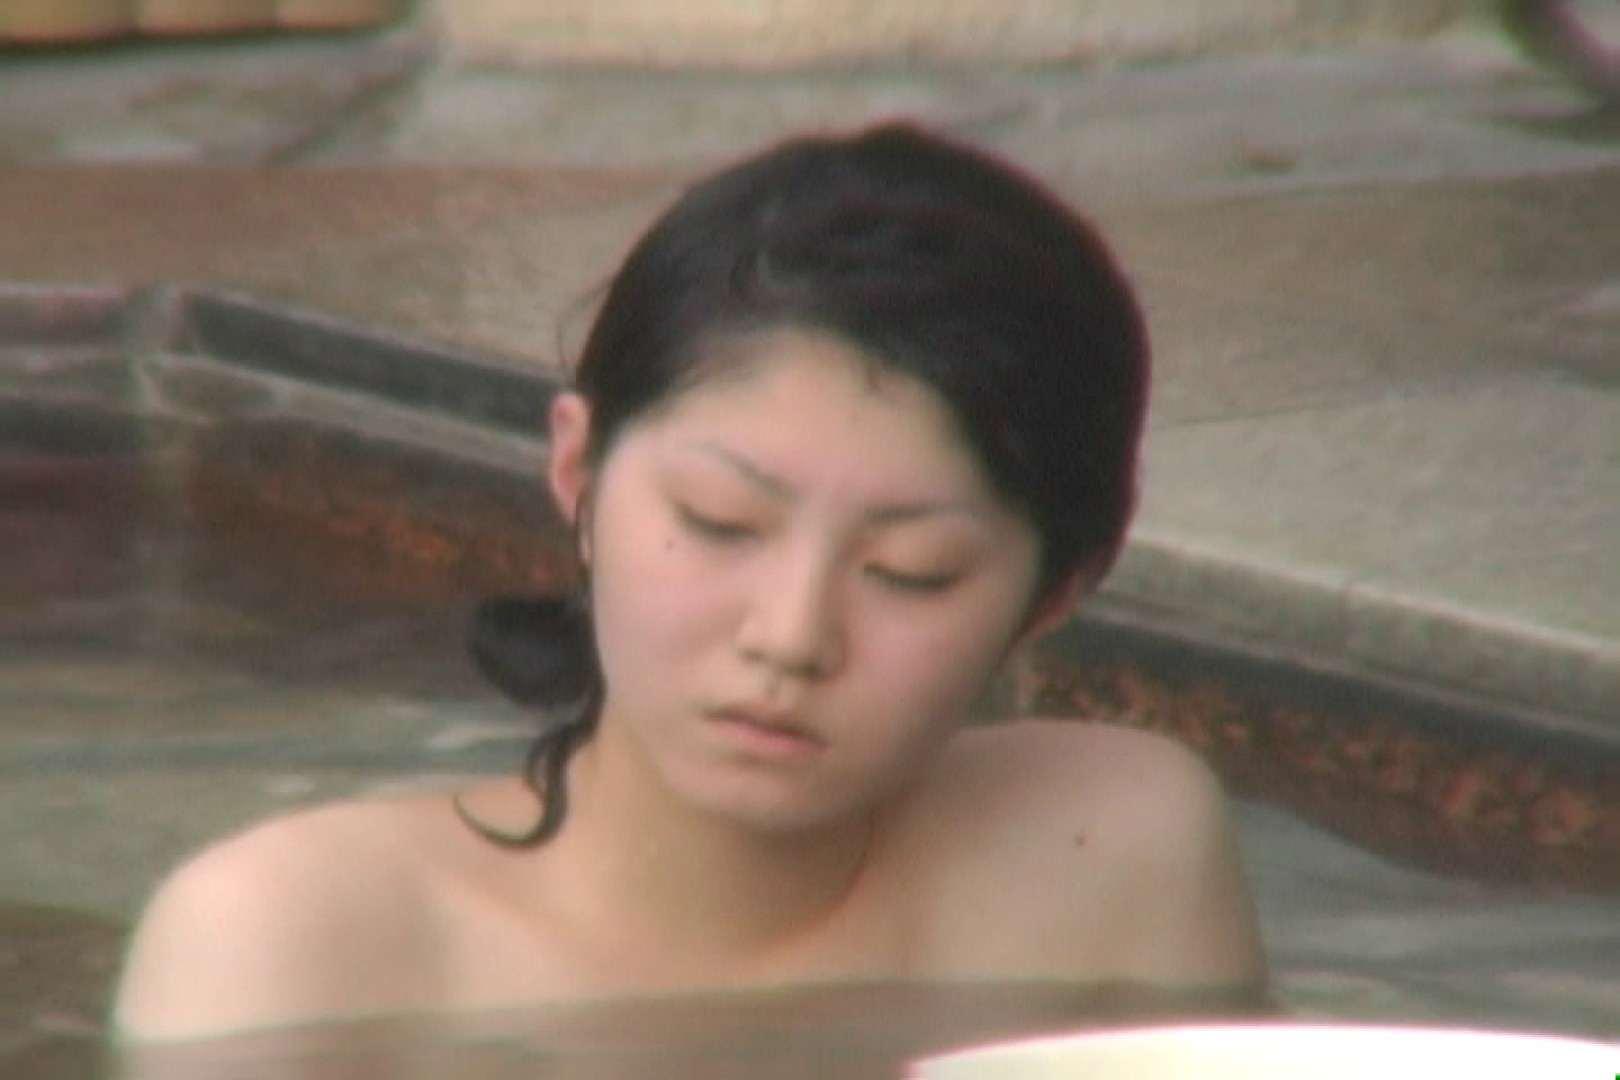 Aquaな露天風呂Vol.579 露天   OLセックス  52画像 34